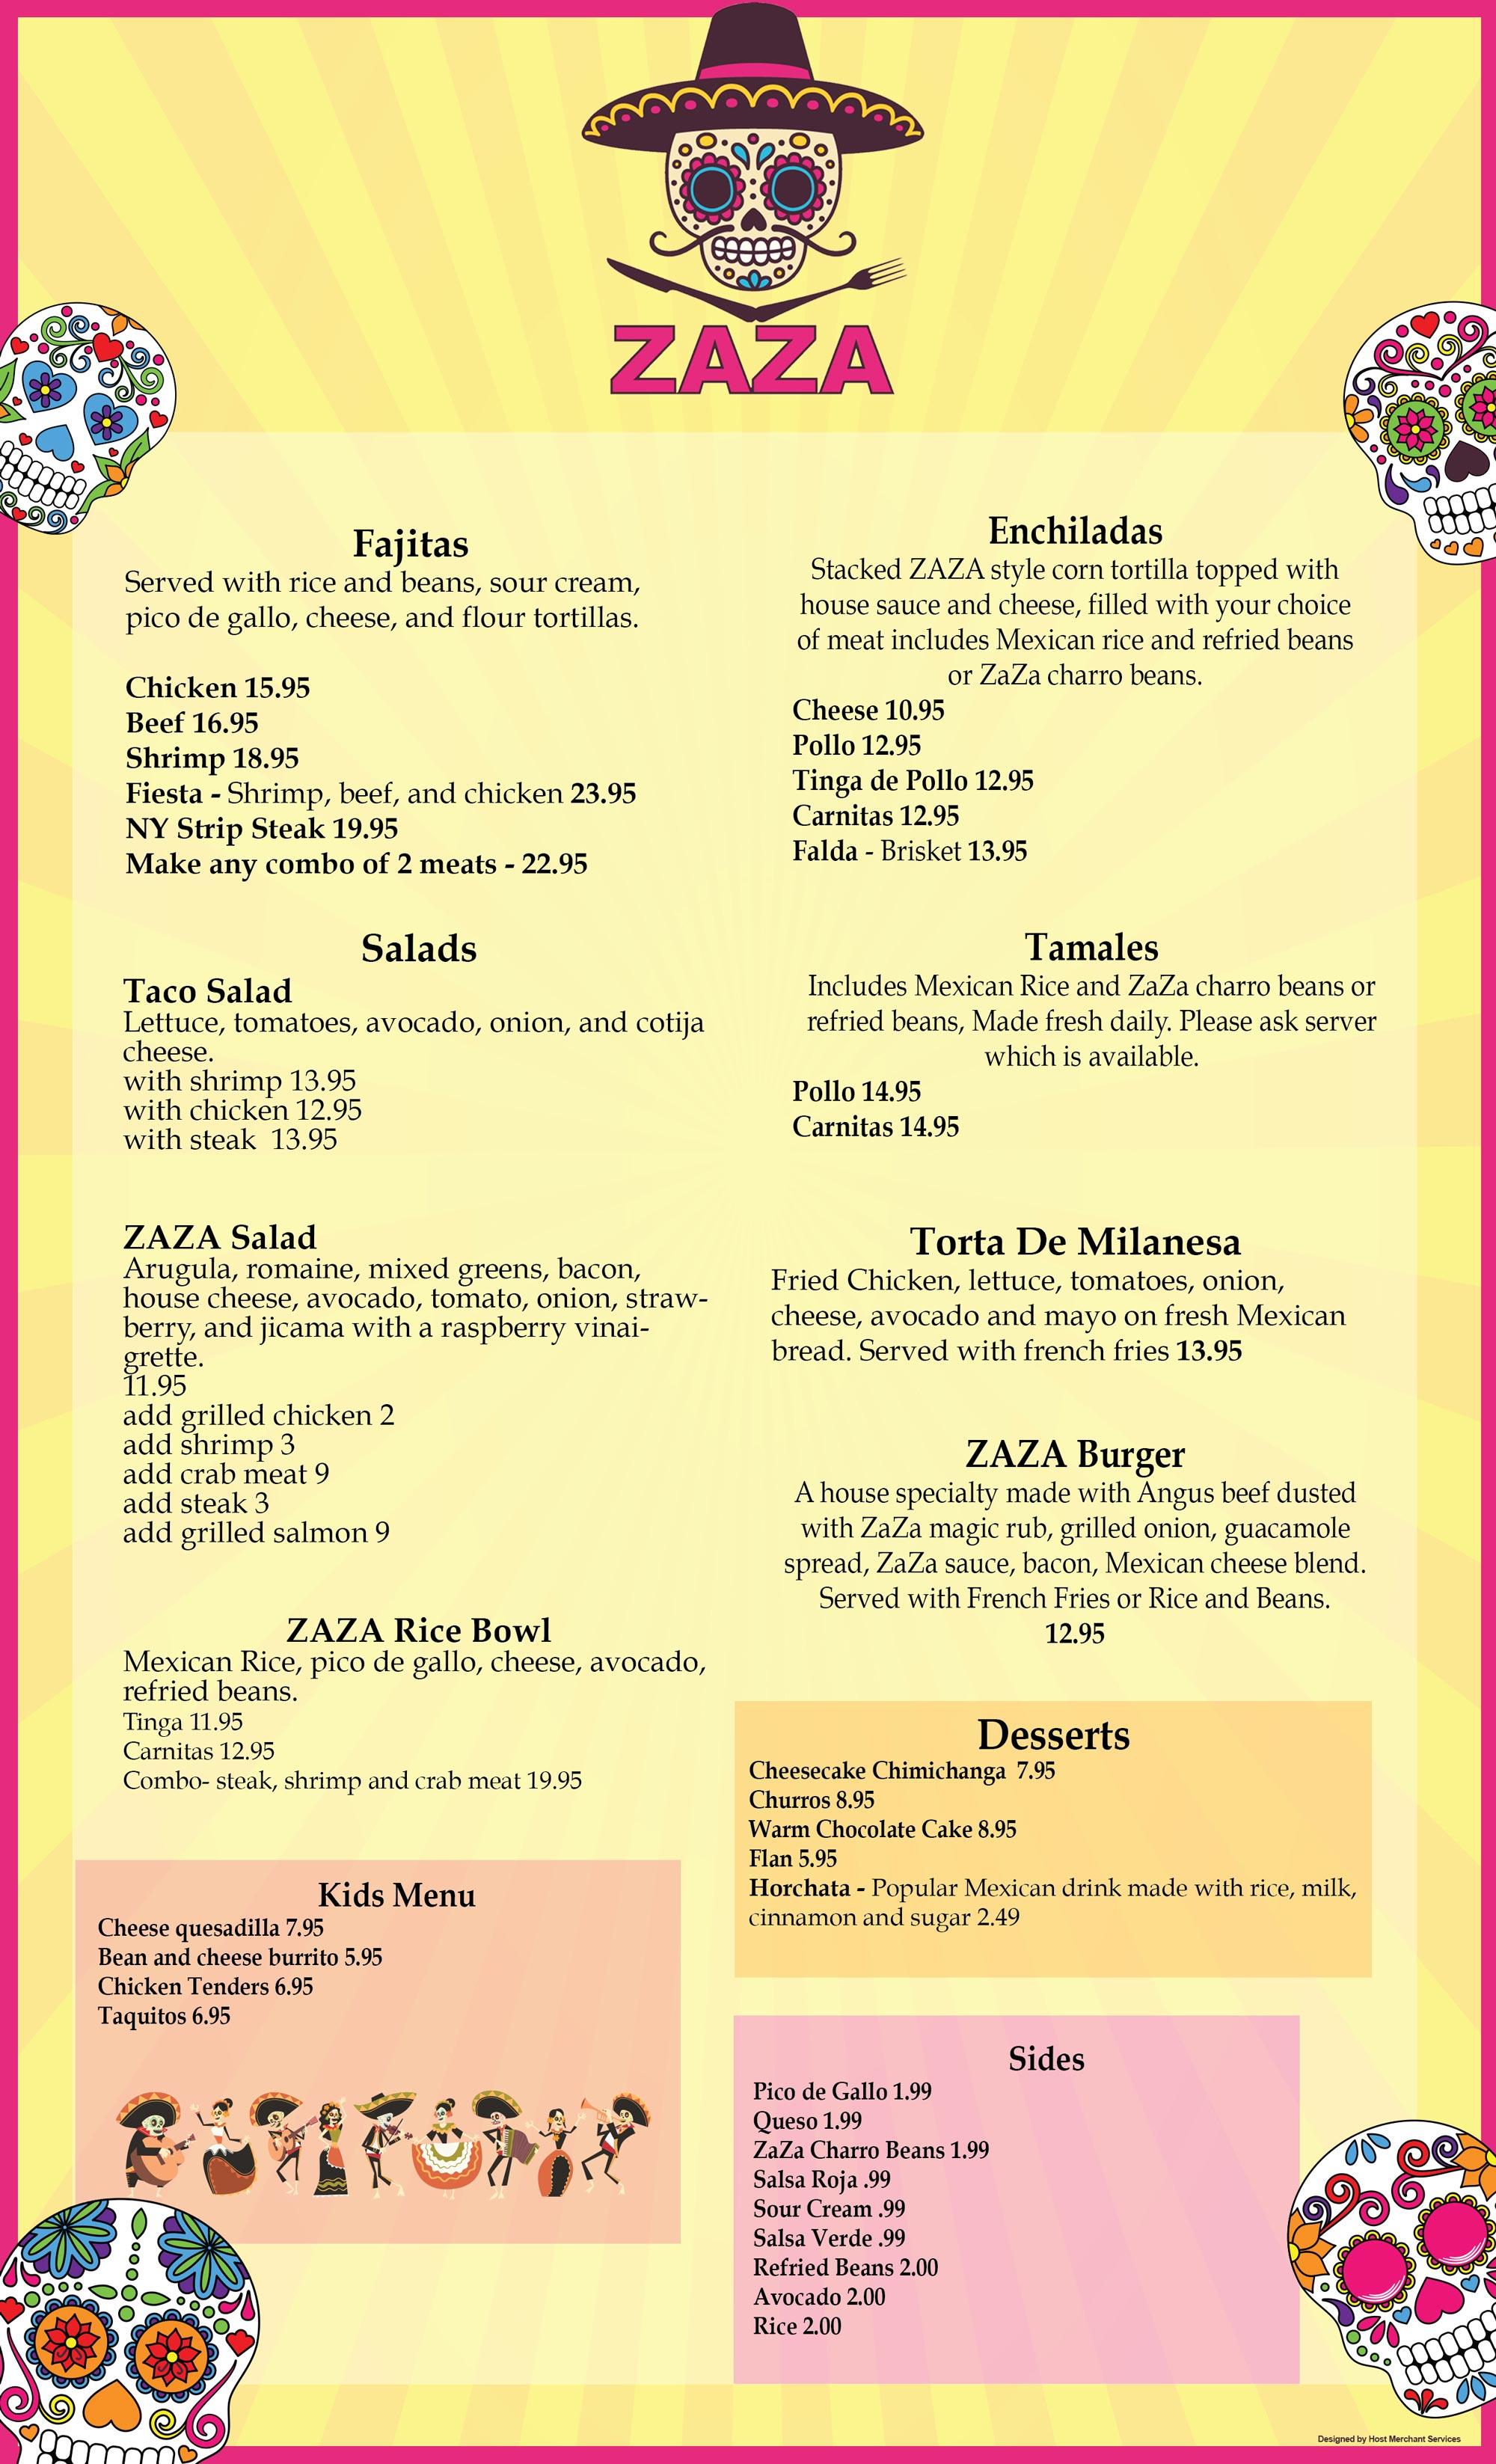 ZAZA Mexican restaurant menu page 2